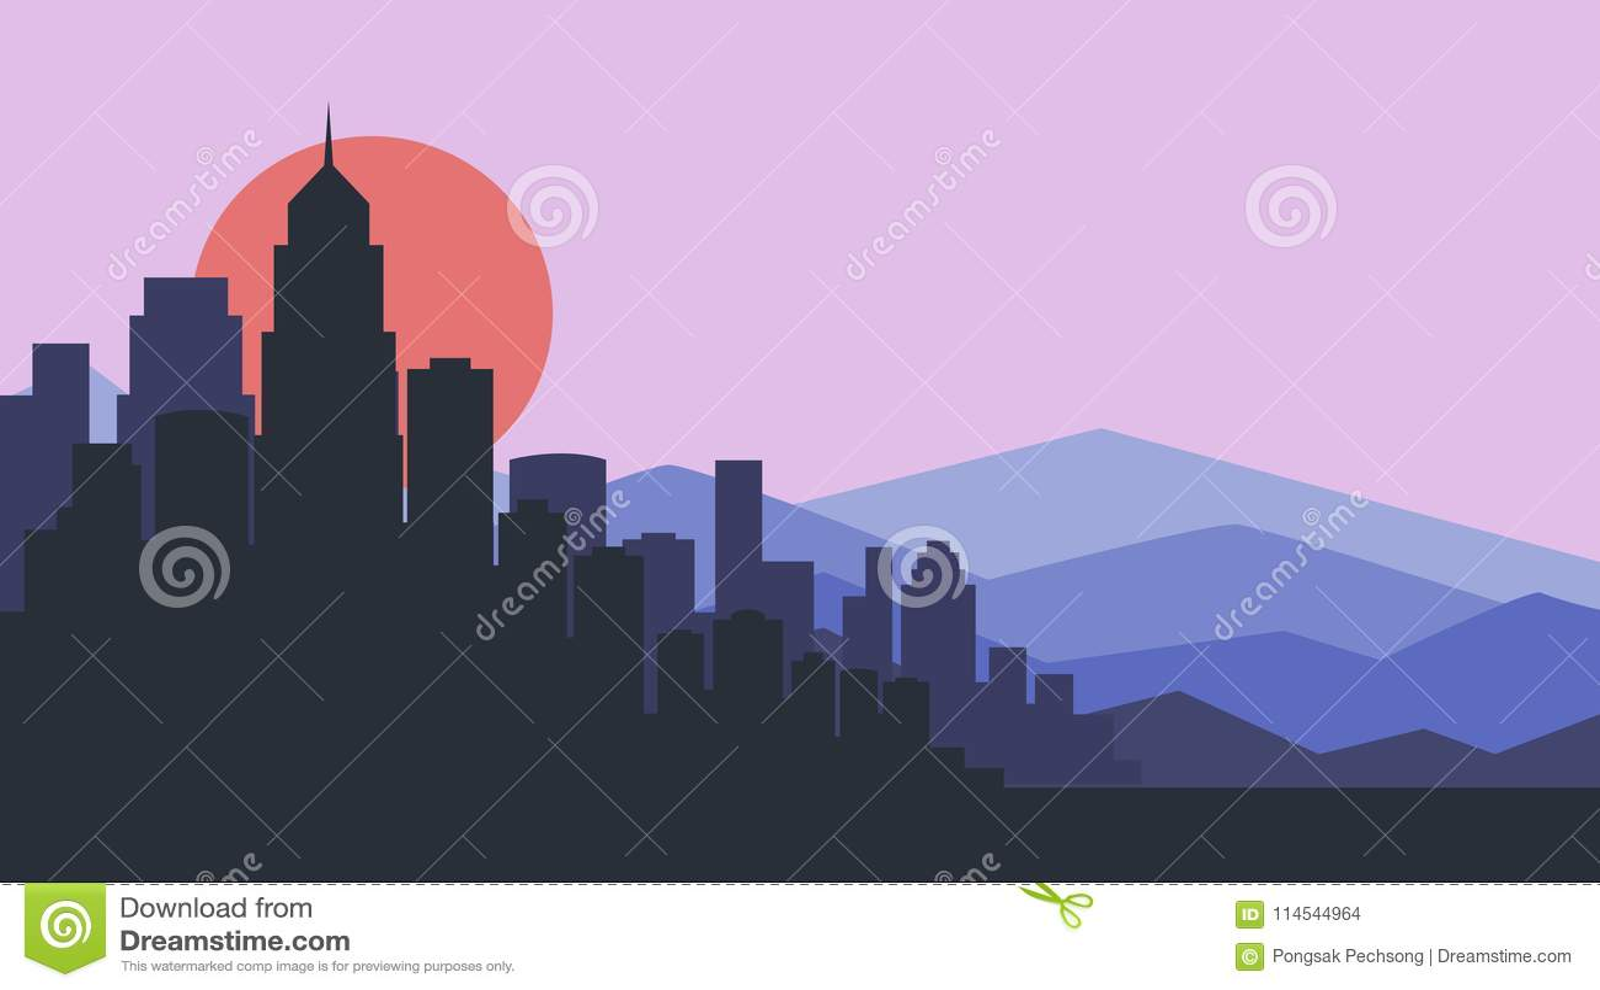 City skyline vector illustration. Urban landscape. purple city silhouette. Cityscape in flat style. Modern city landscape. Citysca